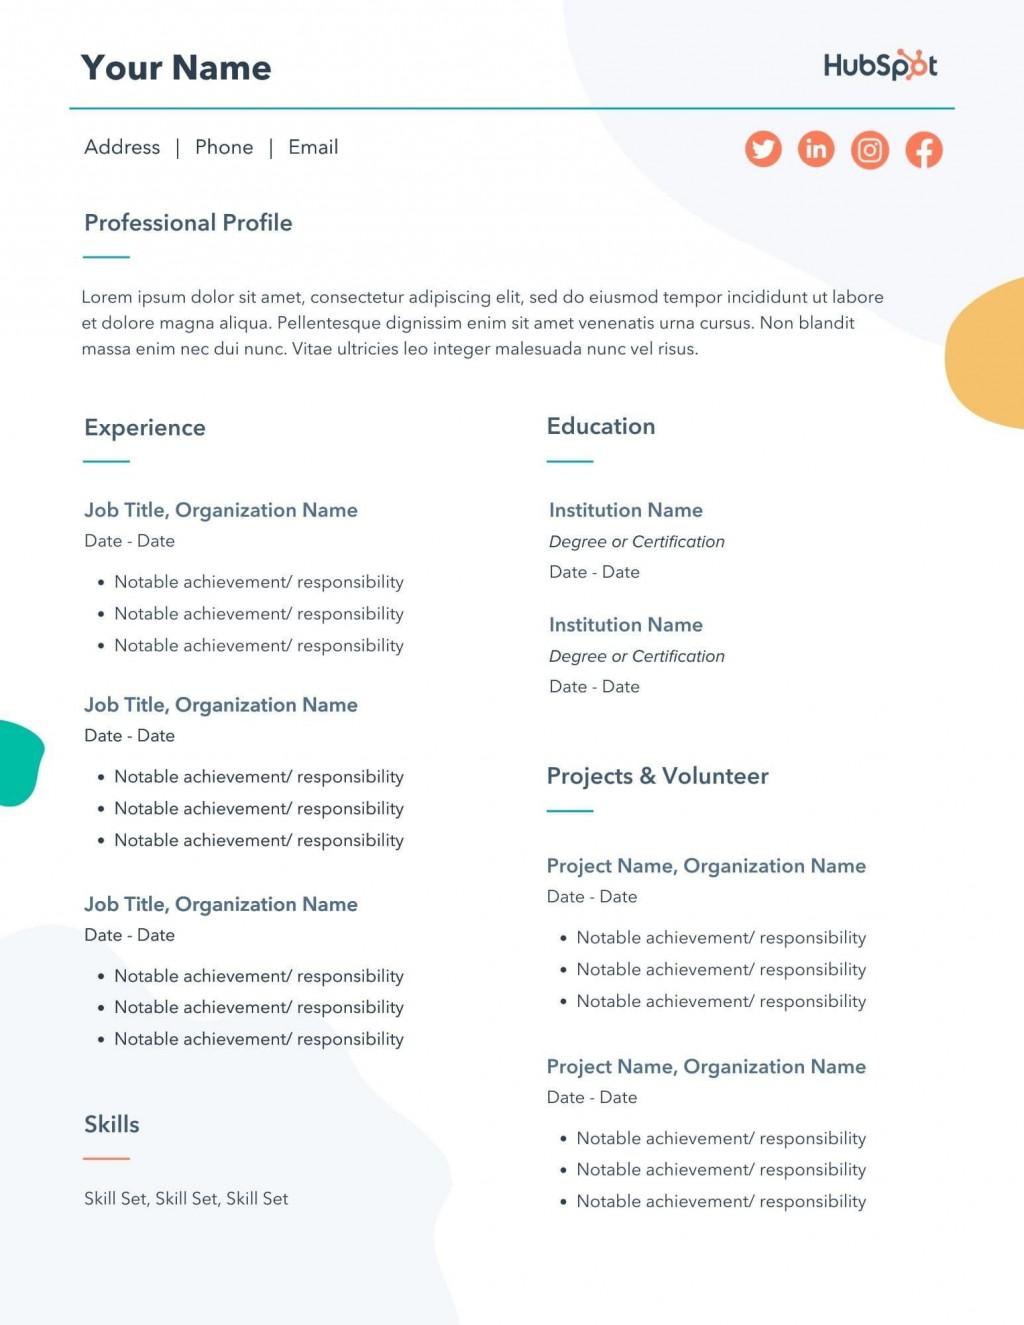 008 Impressive Download Resume Example Free High Resolution  Hr Sample Visual CvLarge